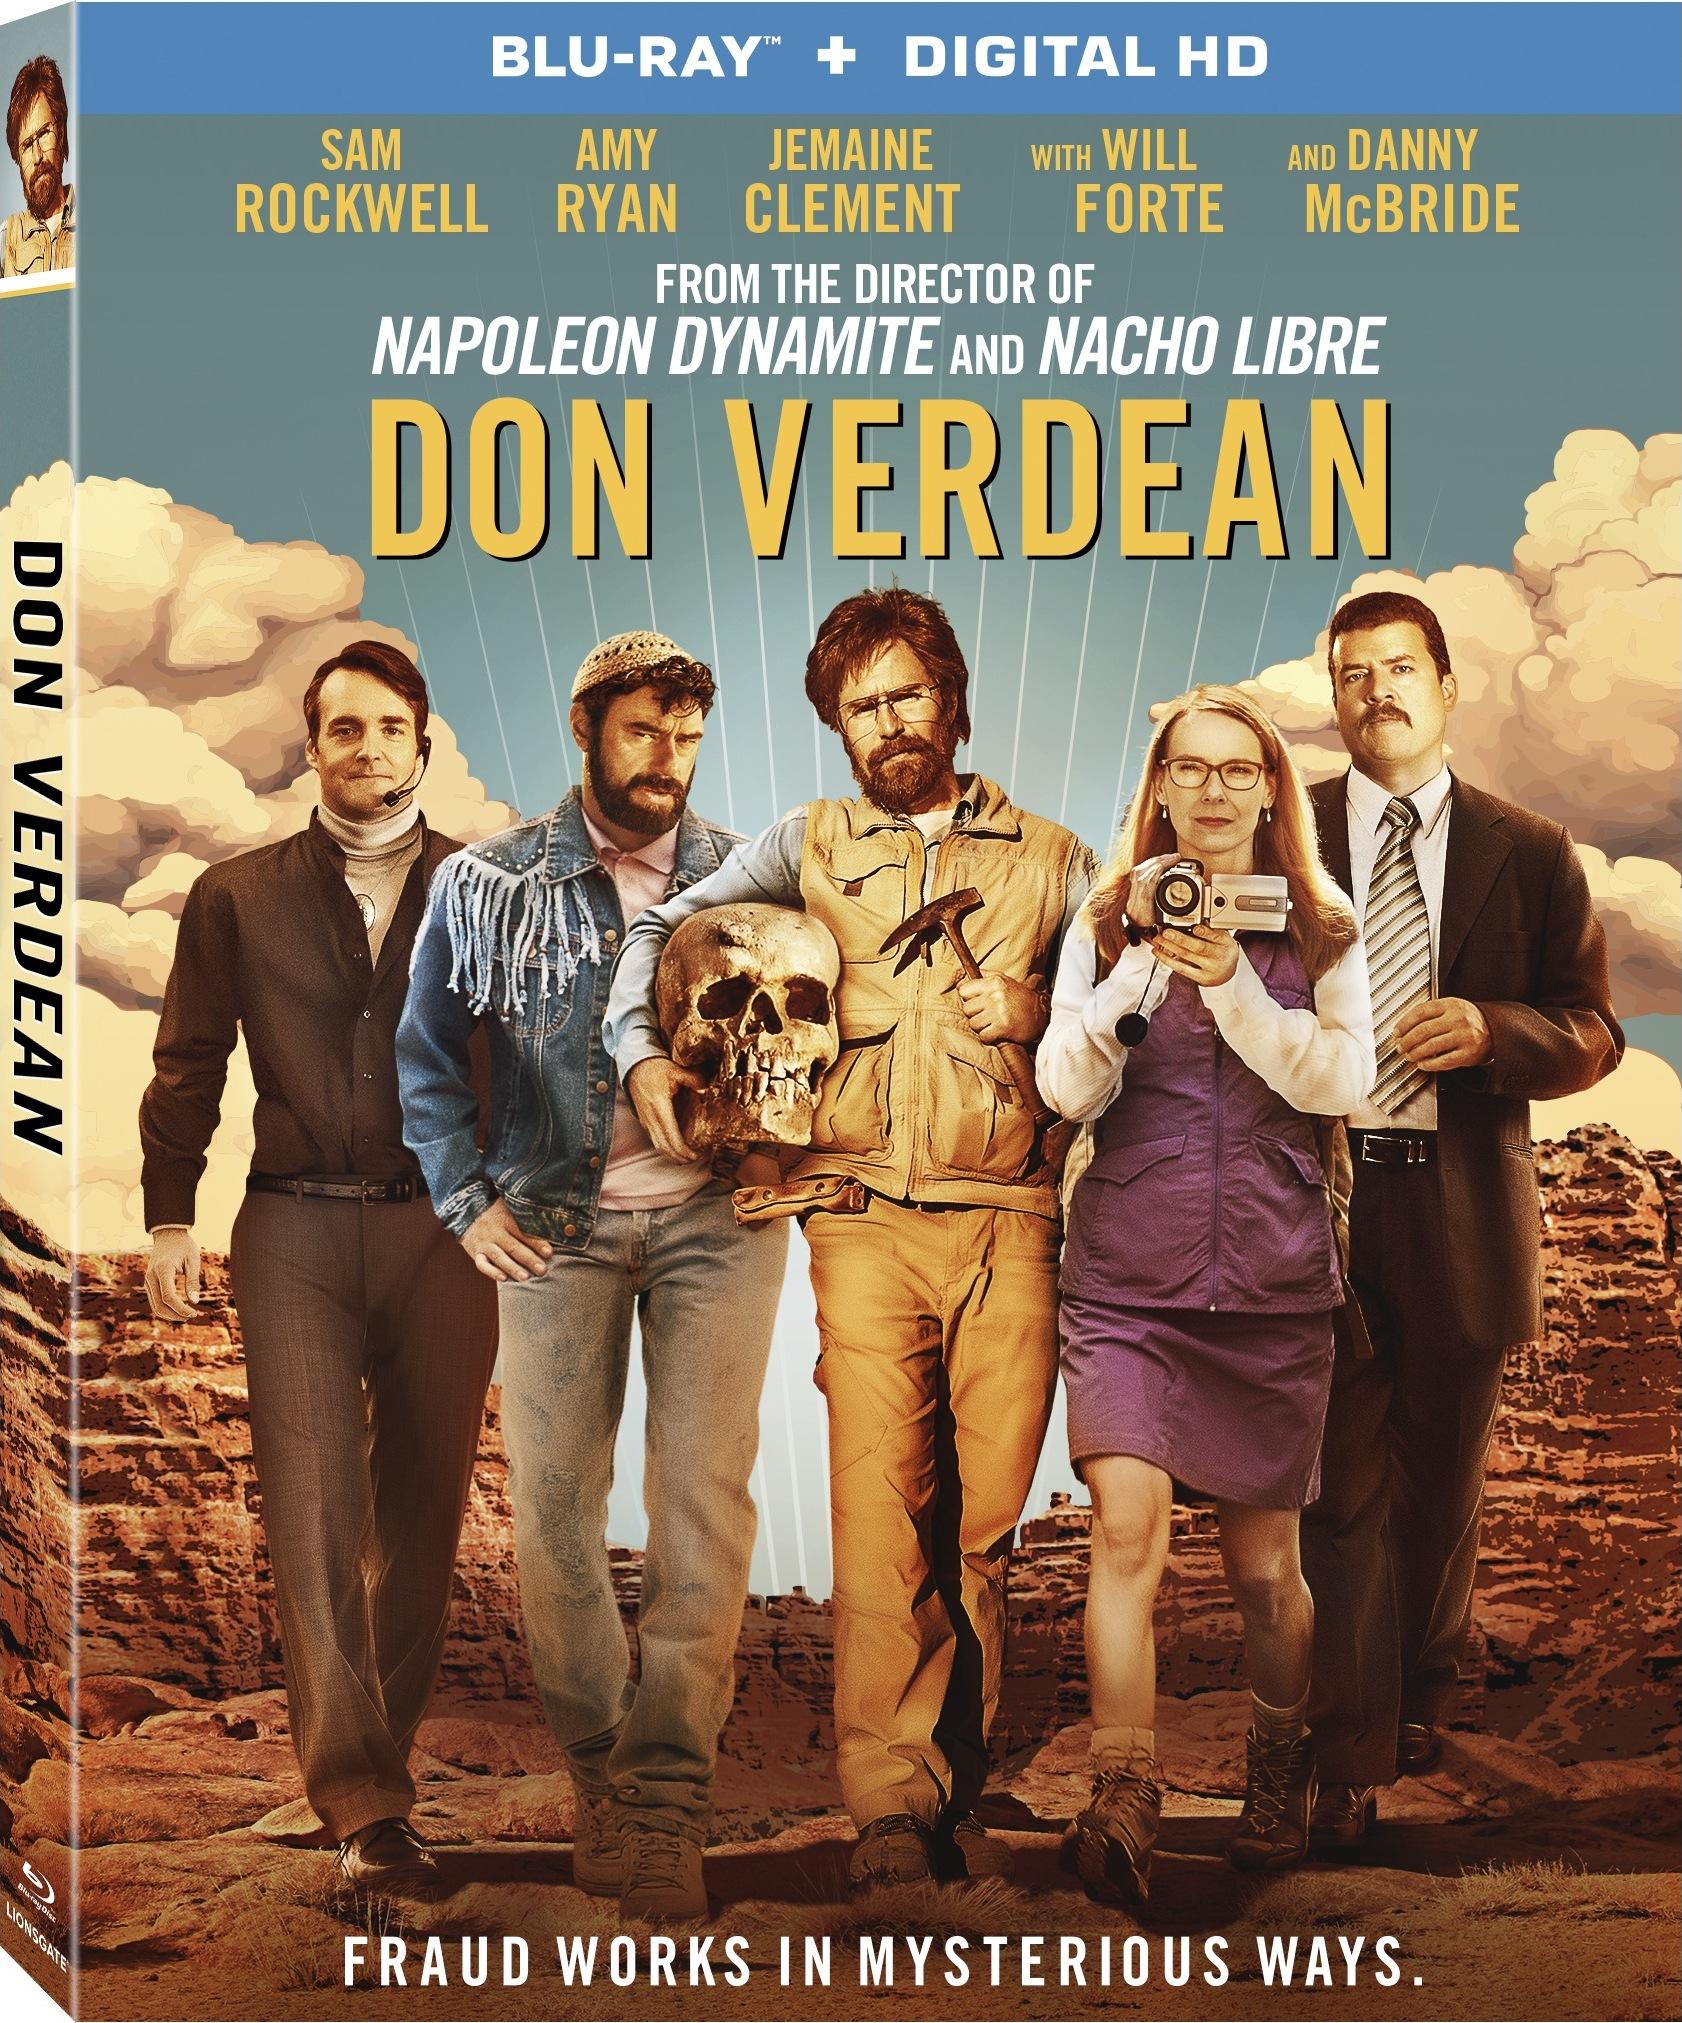 Don Verdean (2015) Blu-ray